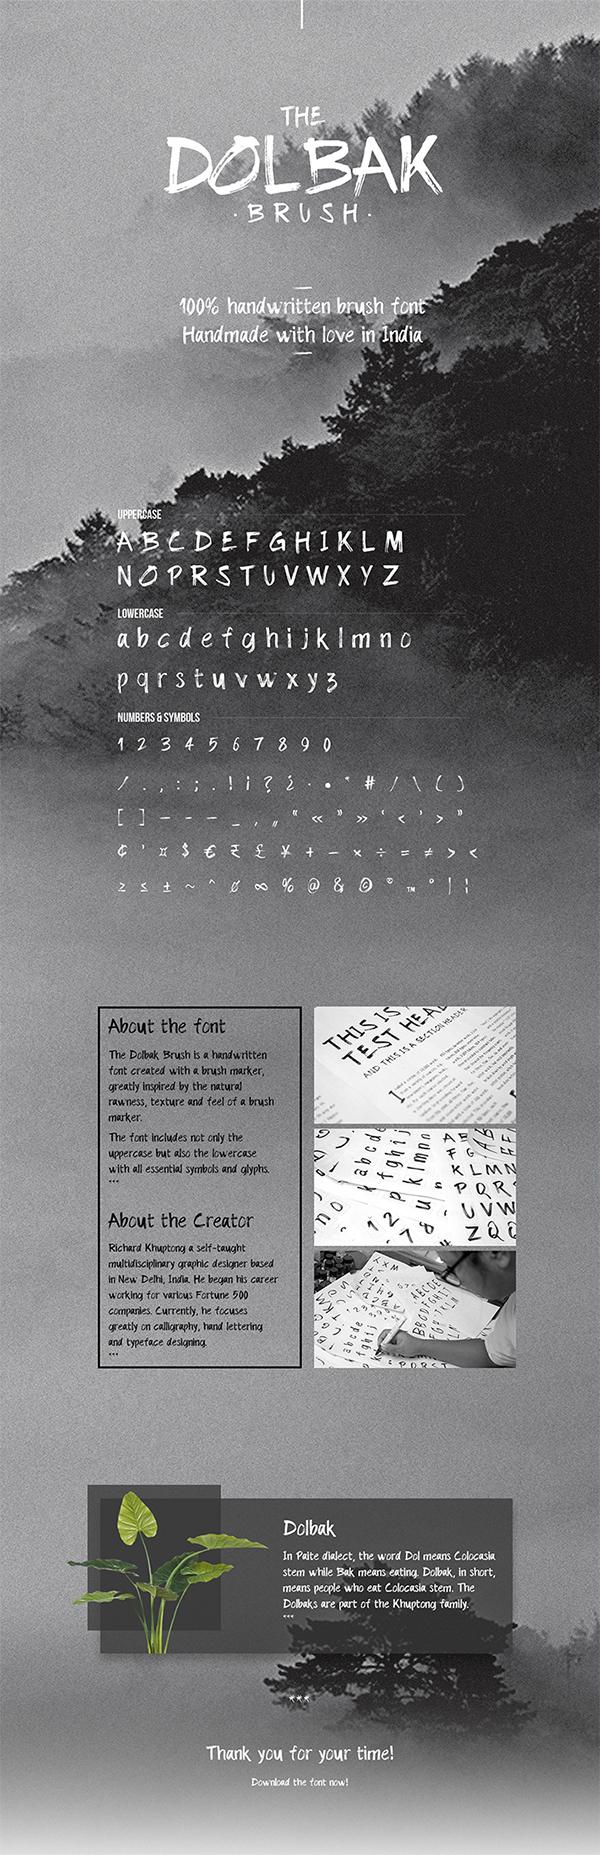 Amazing Dolbak Hand Made Brush Font Free Download